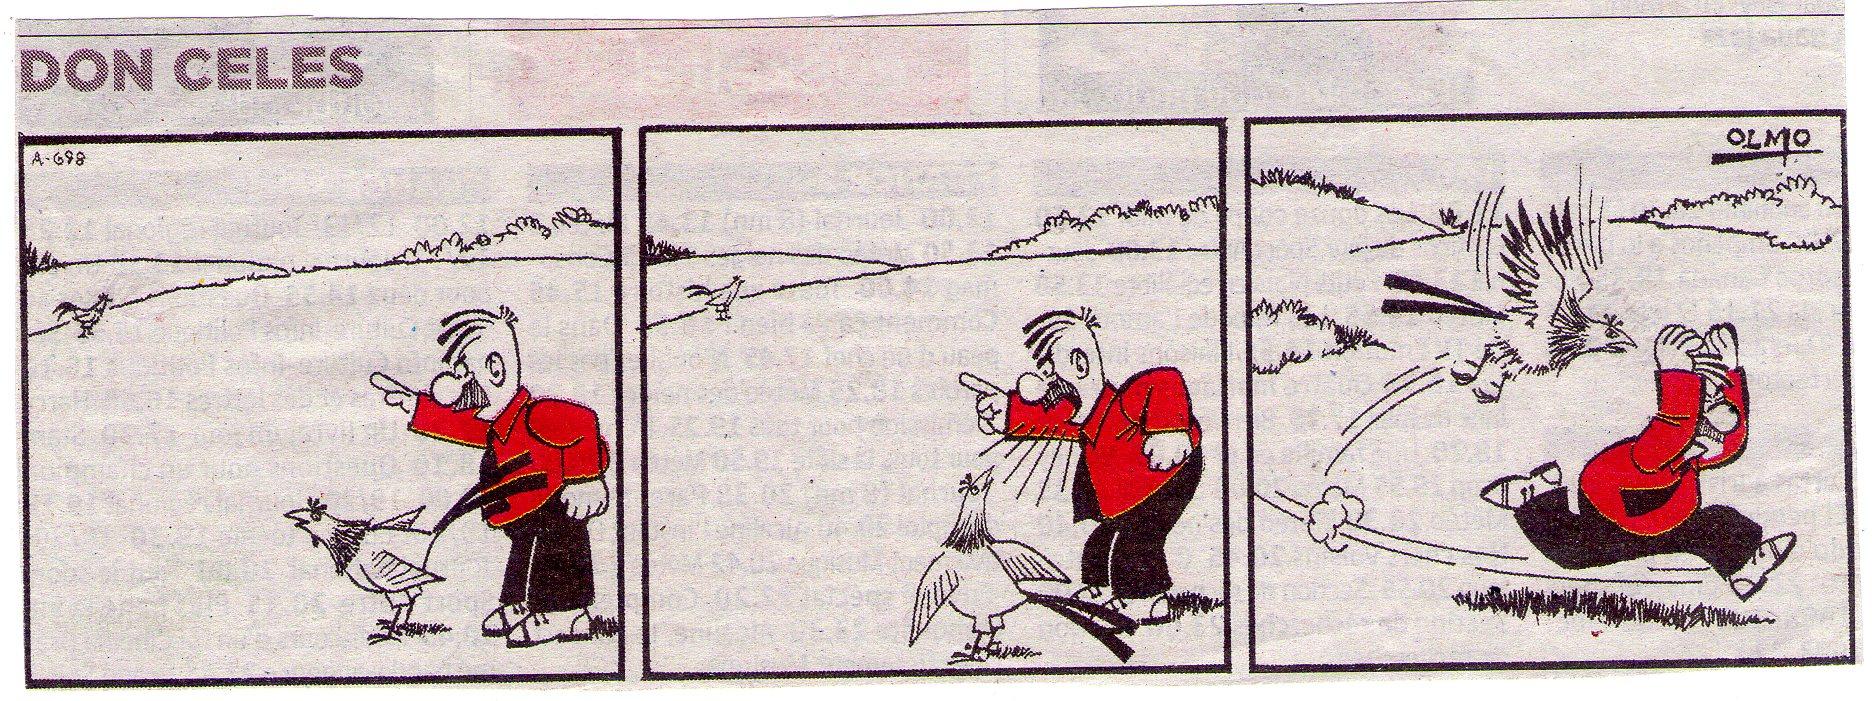 Don Celes hace luchar al gallo